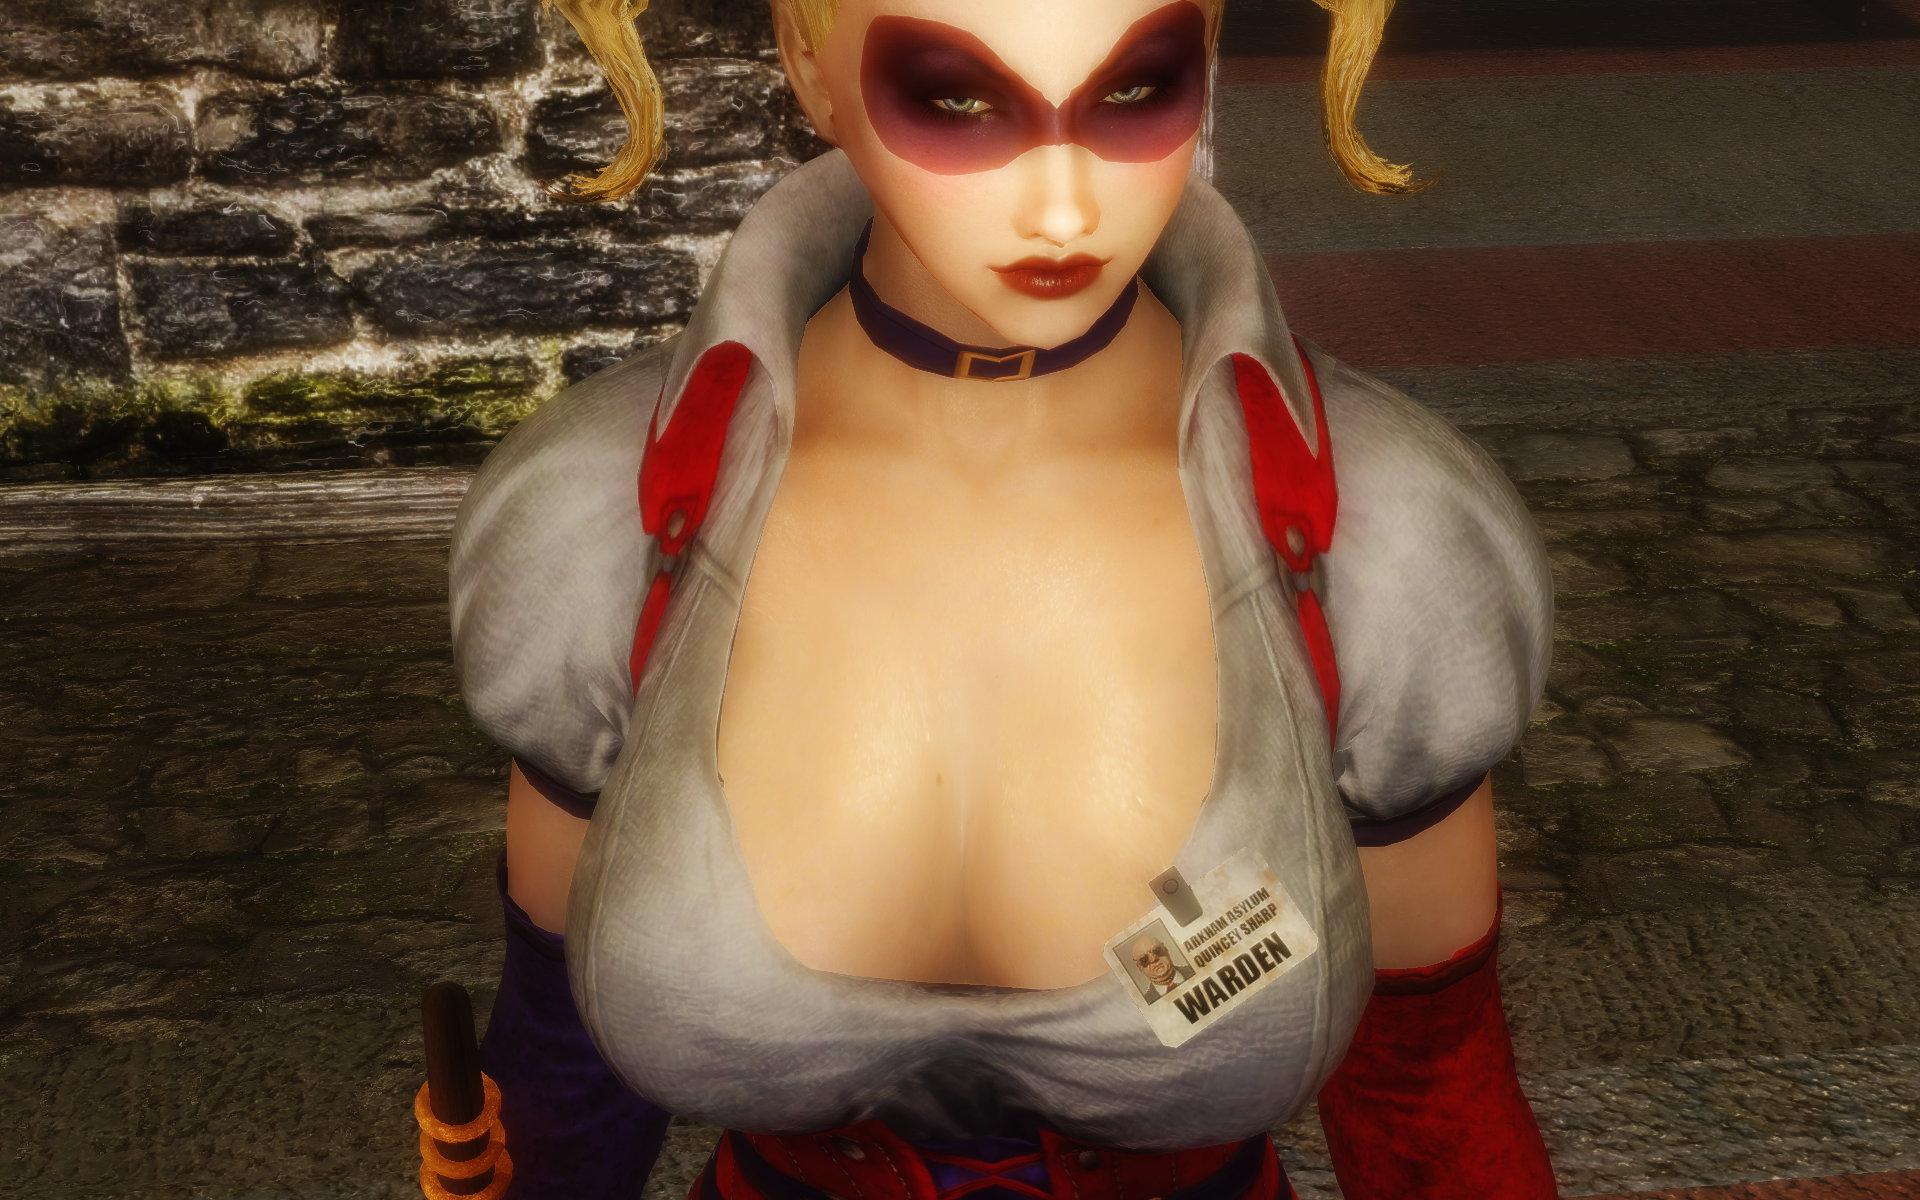 Harley Quinn Arkham Asylum Outfits No-Bra style